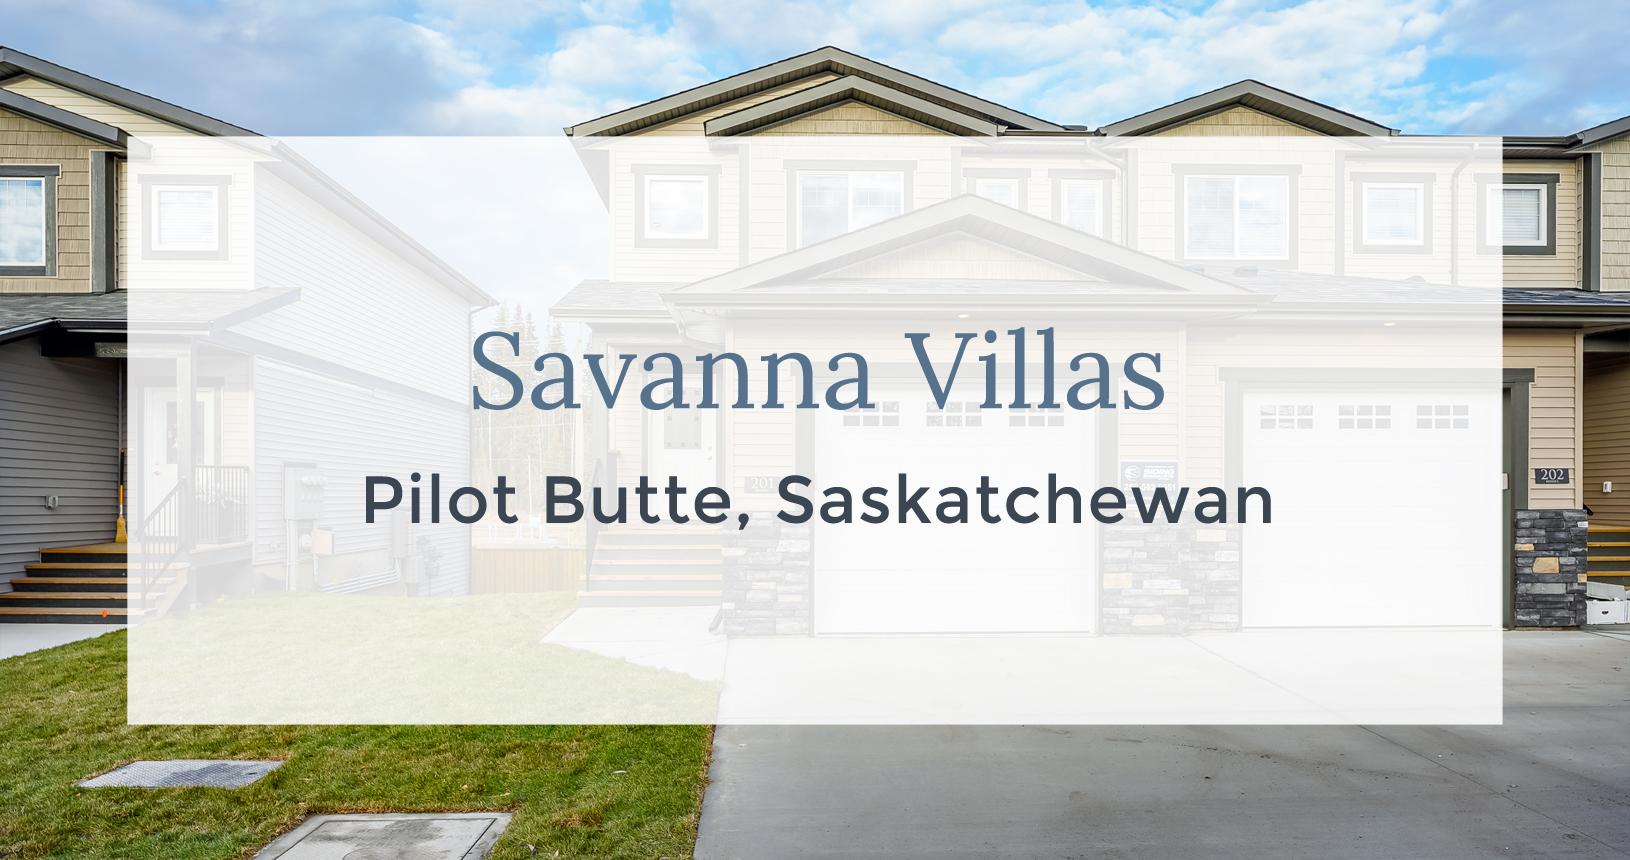 Savanna Villas: Pilot Butte, Saskatchewan